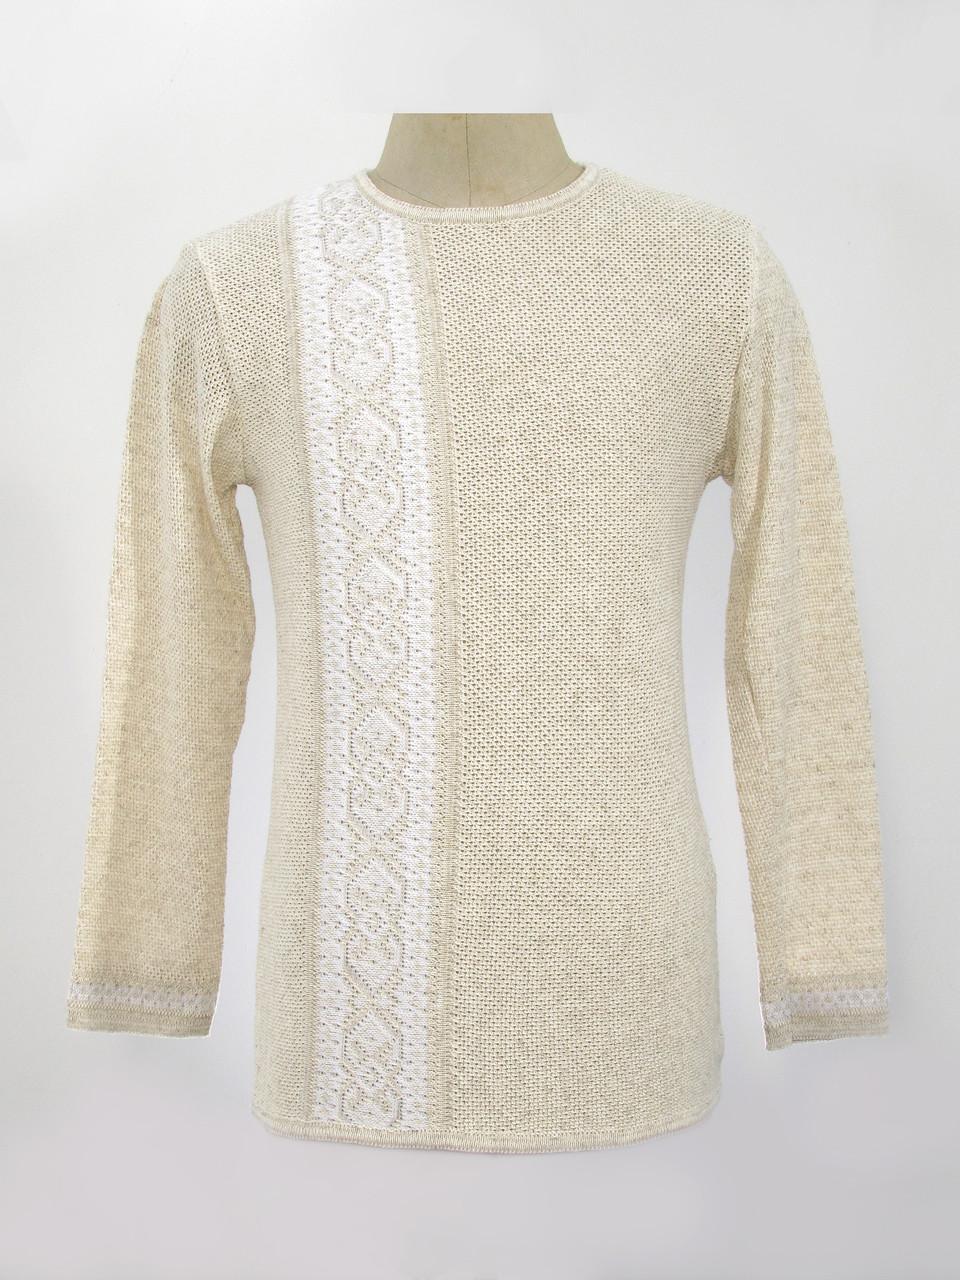 Мужская вязаная рубашка Белая полоска